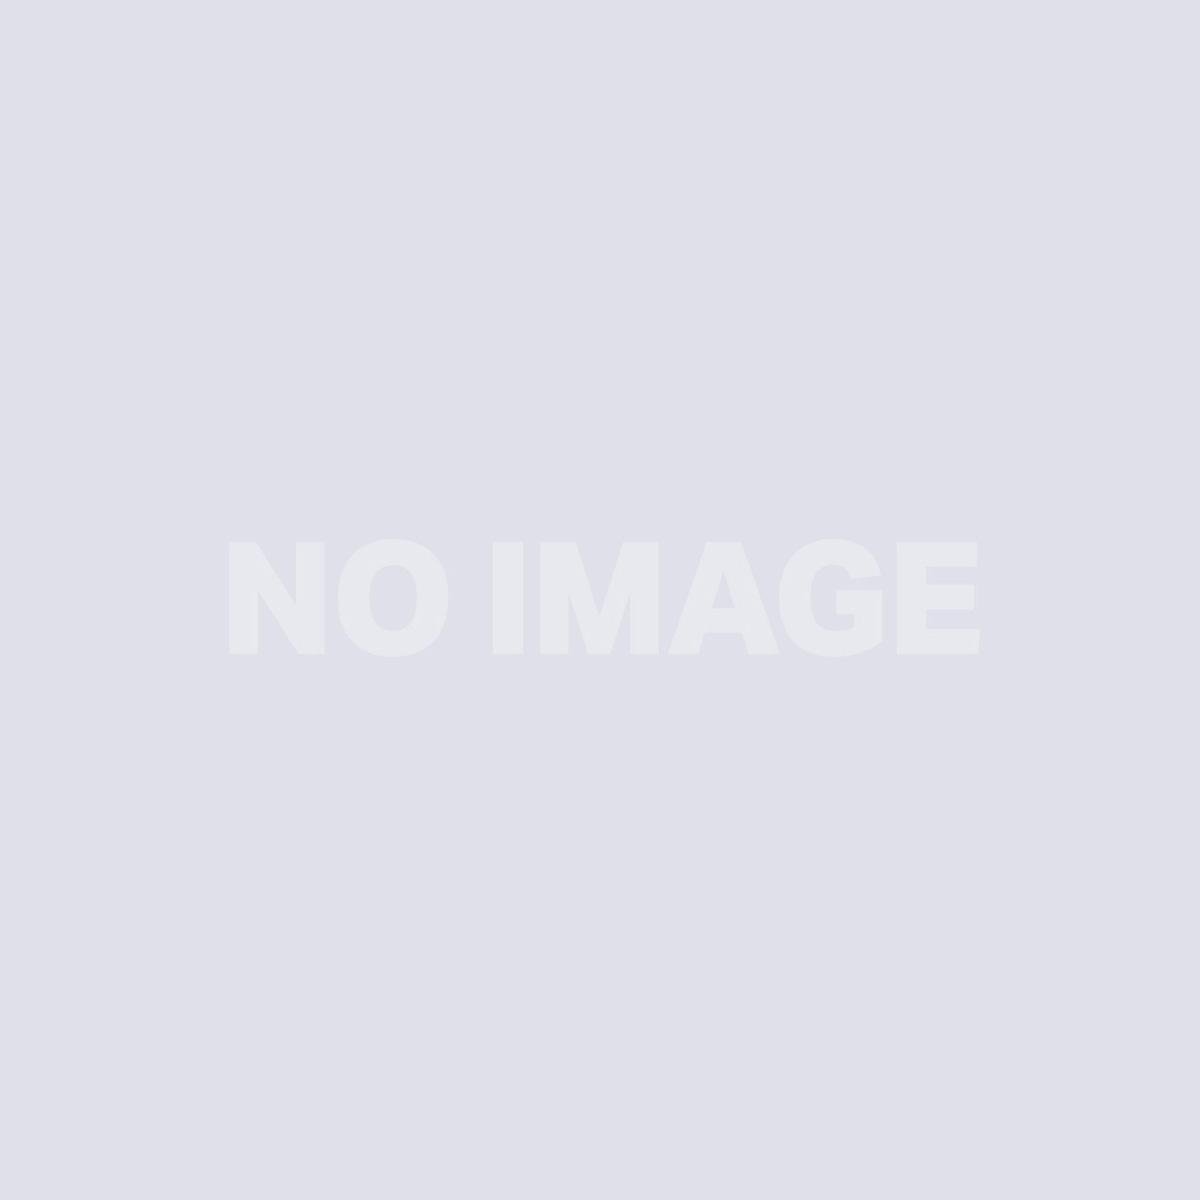 125/42 Nylon Swivel Castor with Ball Bearings